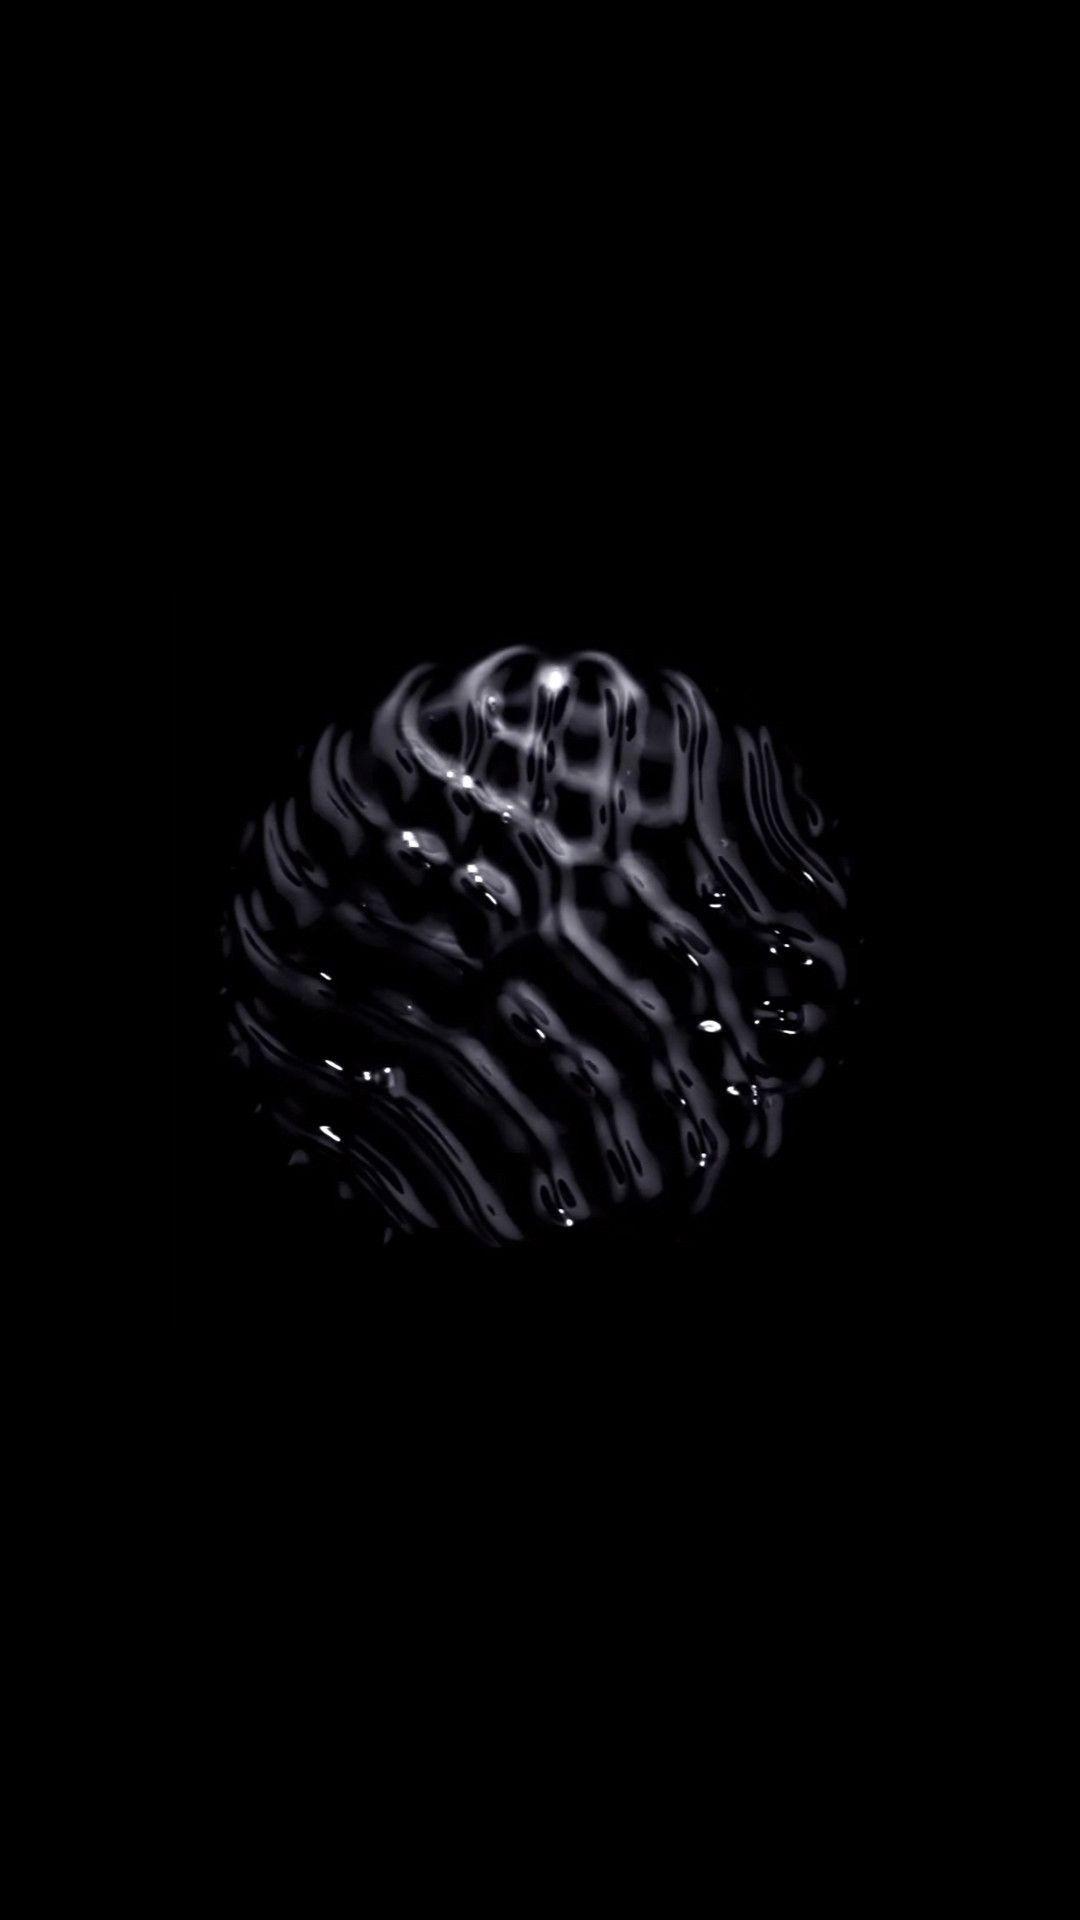 Beautiful Jet Black Wallpaper Iphone